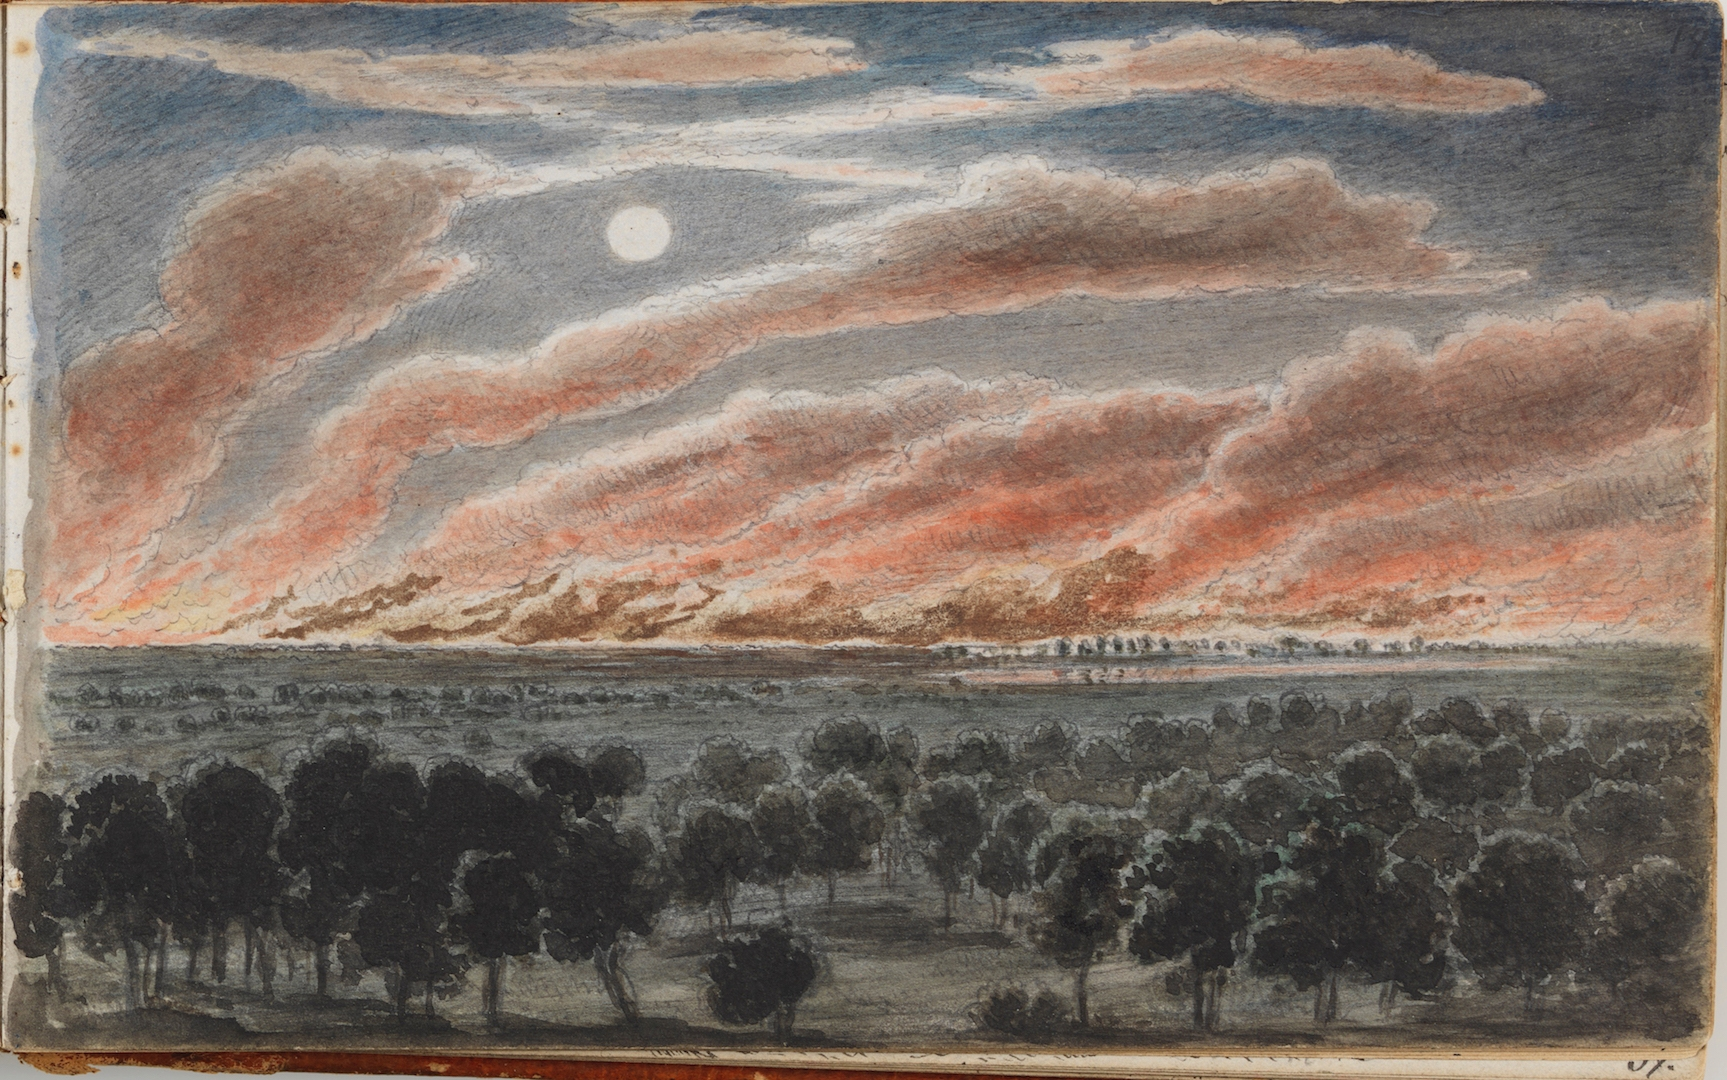 Bushfire image